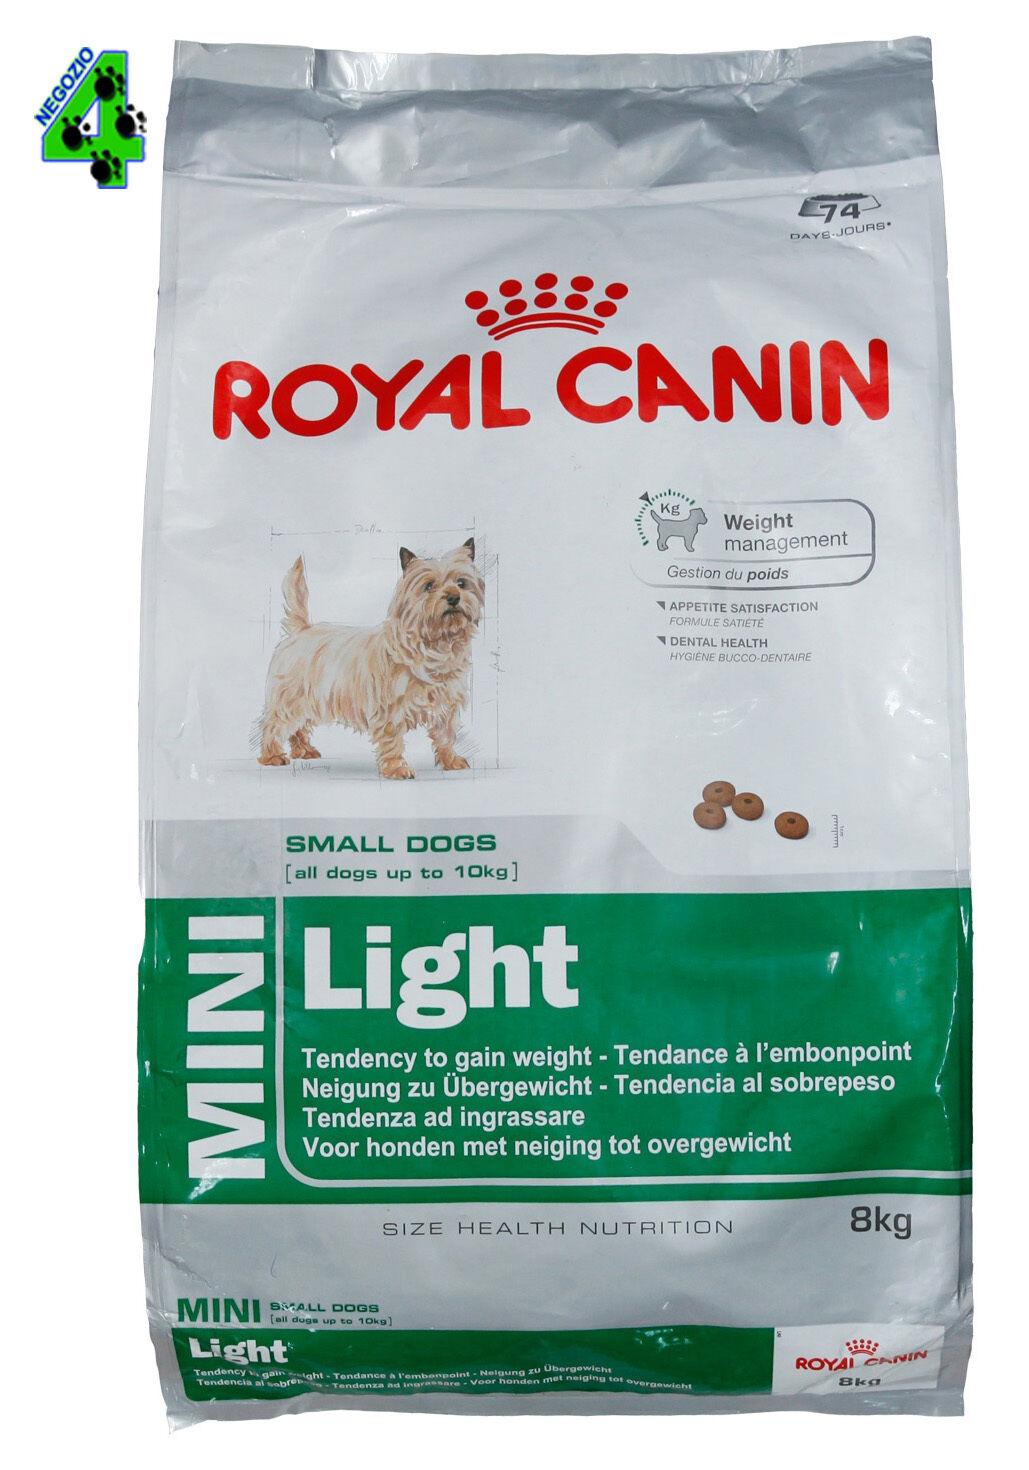 ROYAL CANIN MINI light 8 KG CANE CROCCHETTE CANI DI TAGLIA PICCOLA obesi